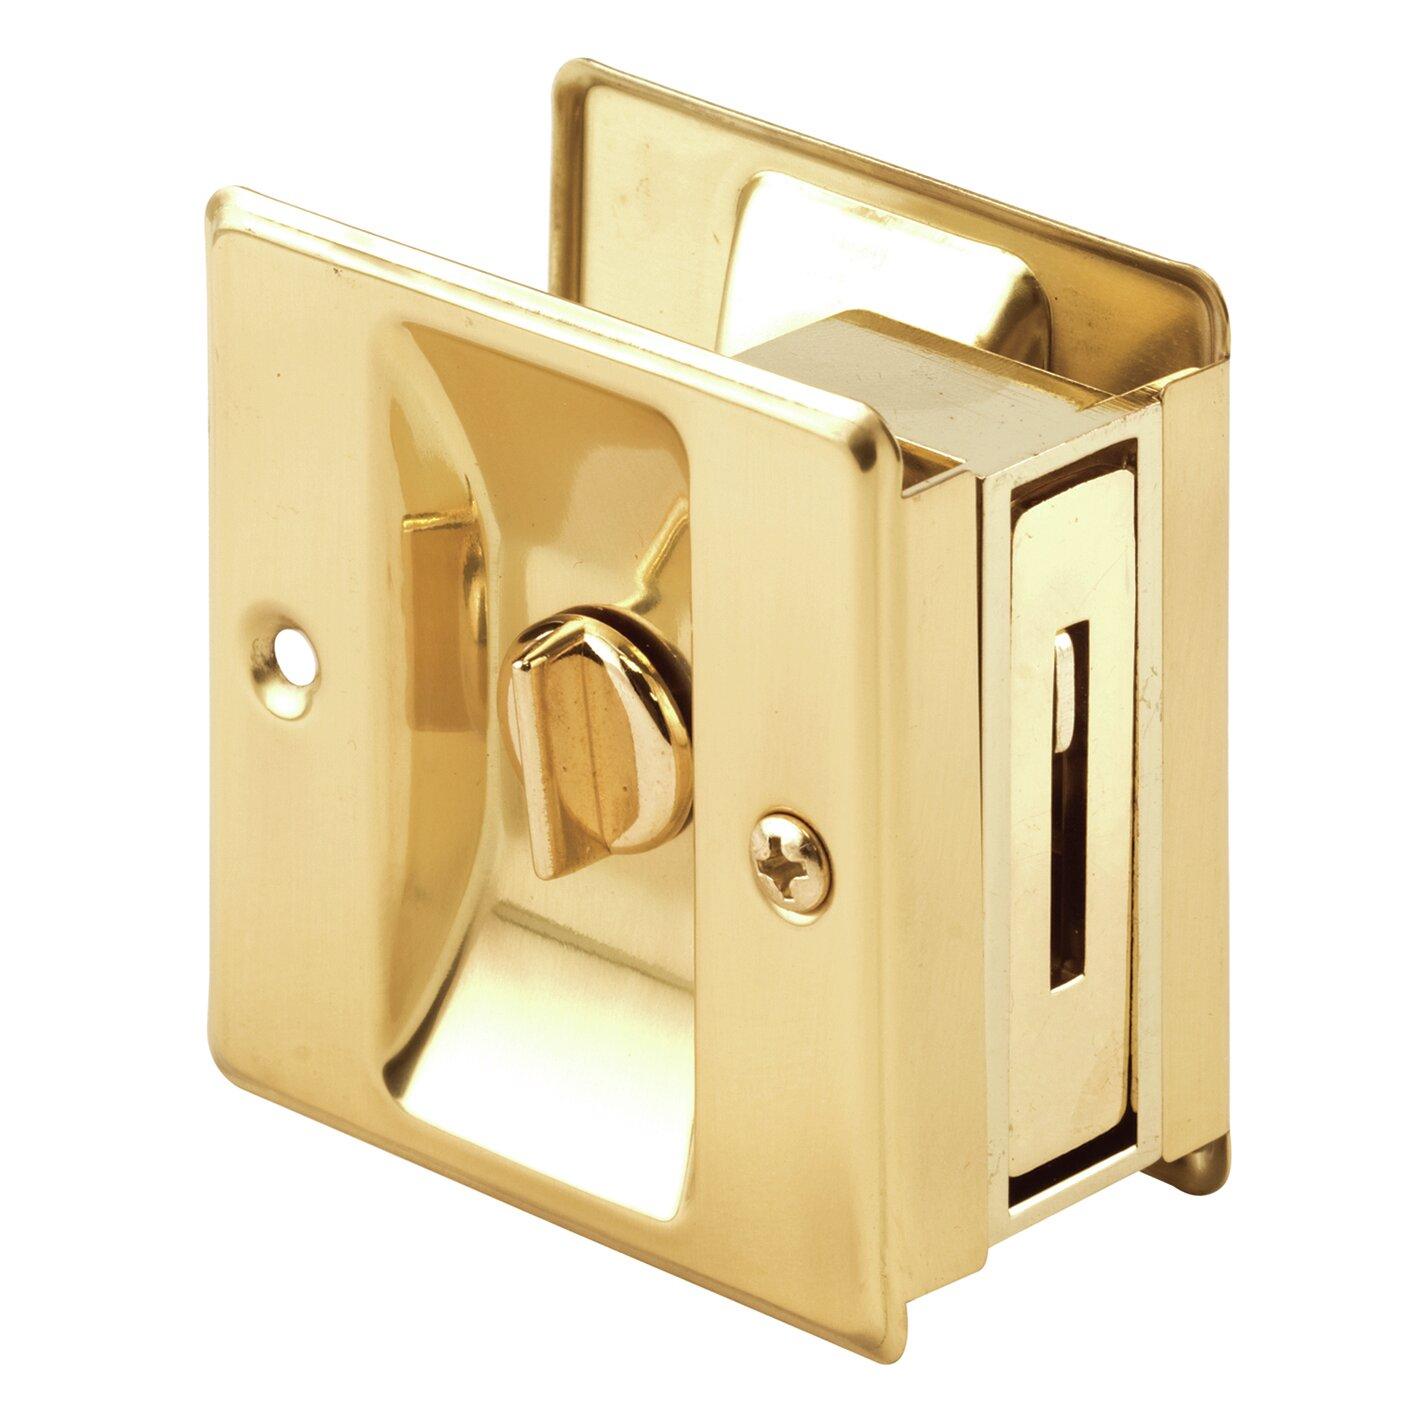 Primeline Privacy Lock Pocket Door Hardware With Pull Reviews